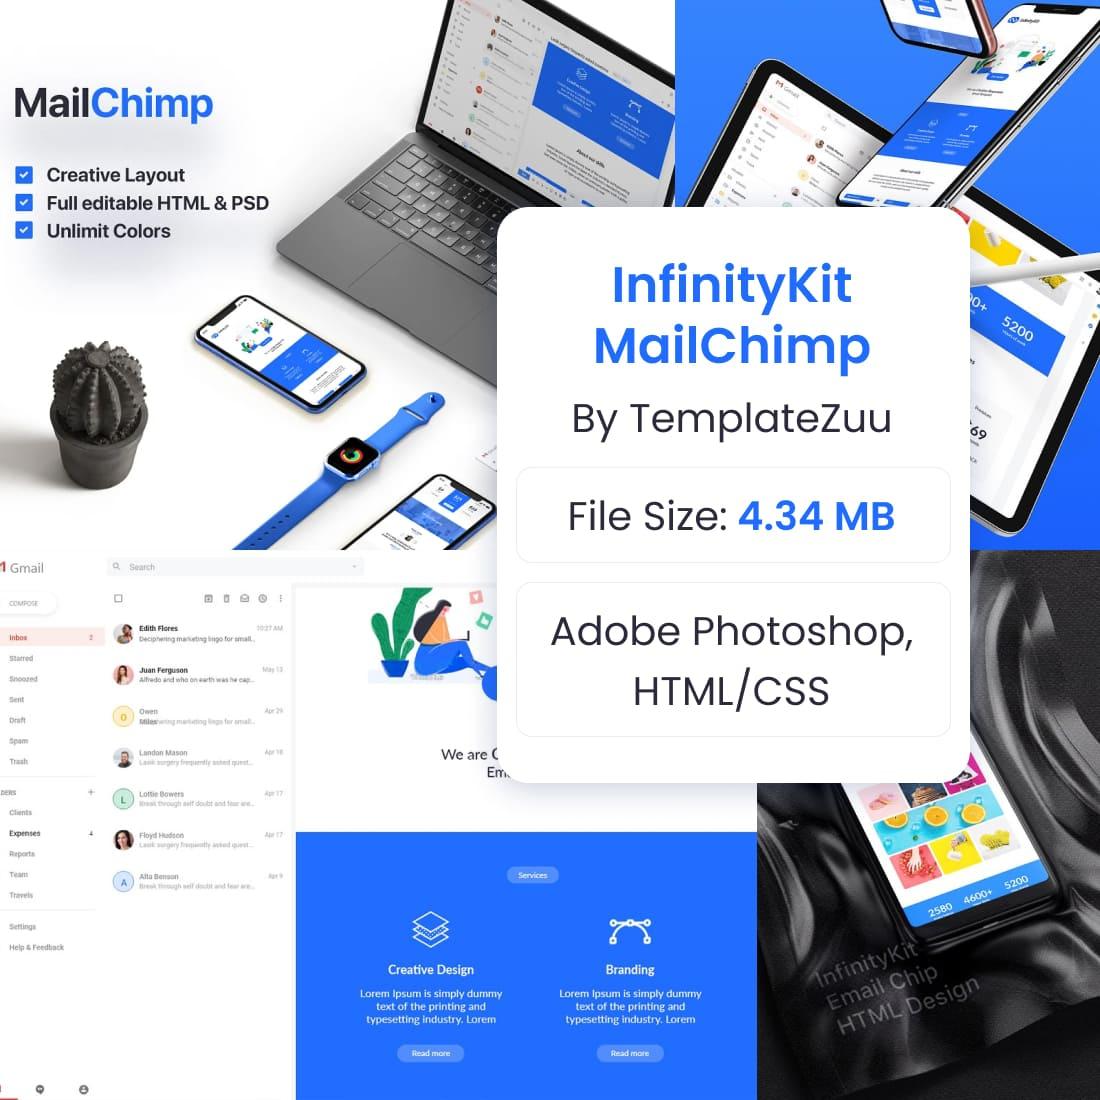 InfinityKit MailChimp by MasterBundles.